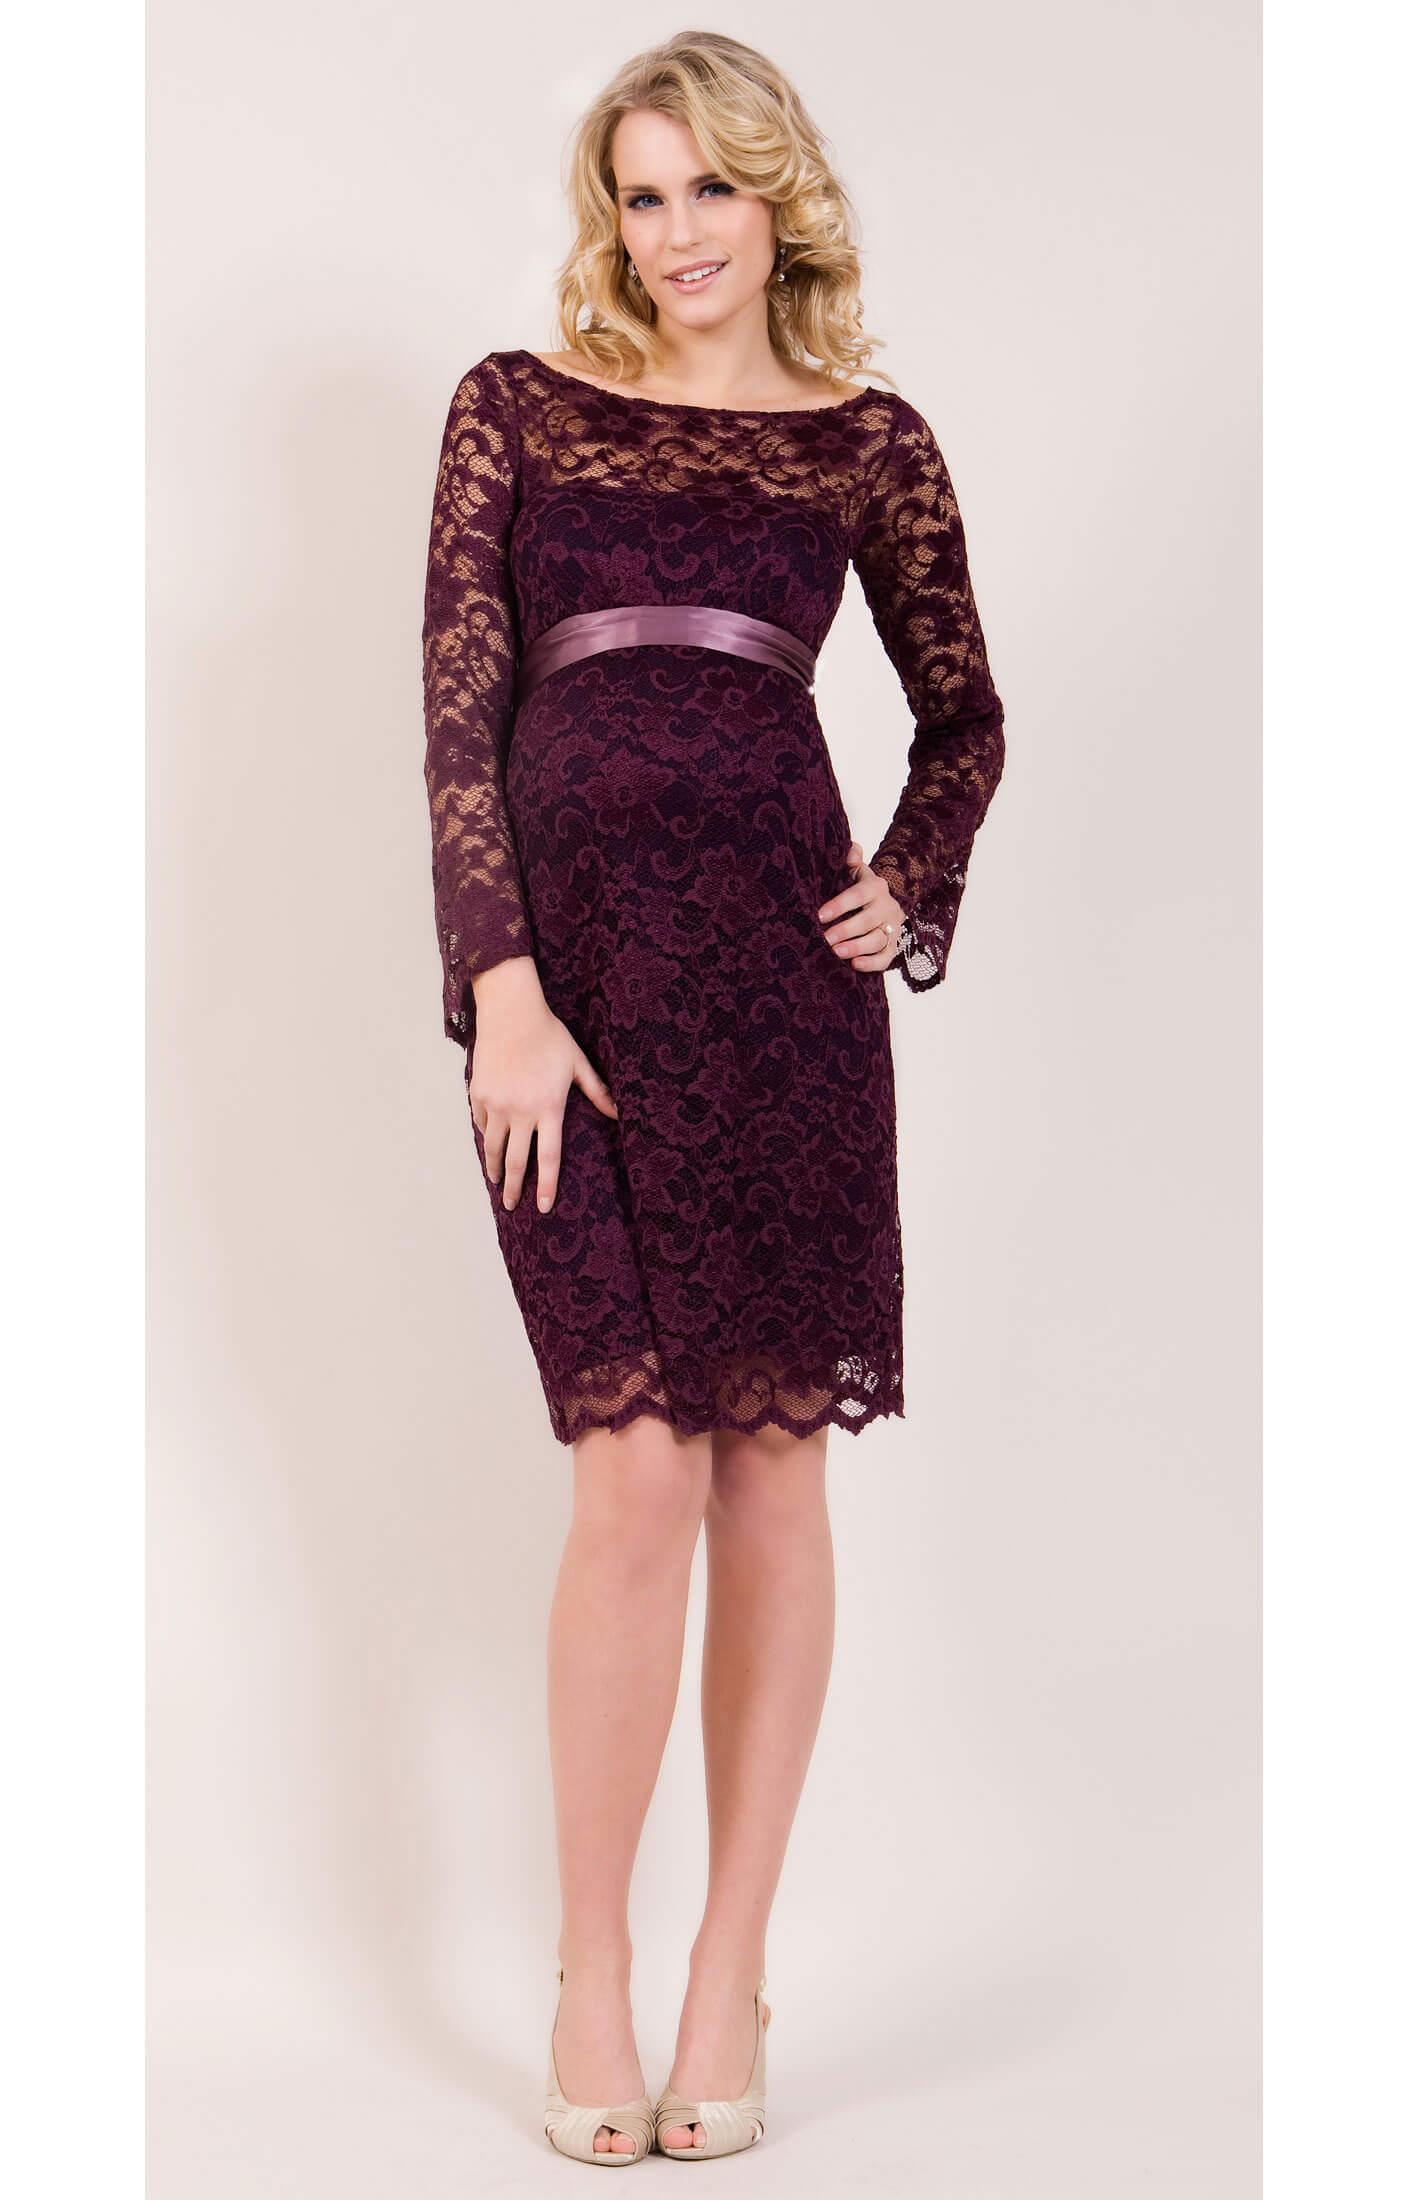 Chloe Lace Maternity Dress (Claret) maternity dresses for weddings Chloe Lace Maternity Dress Claret by Tiffany Rose